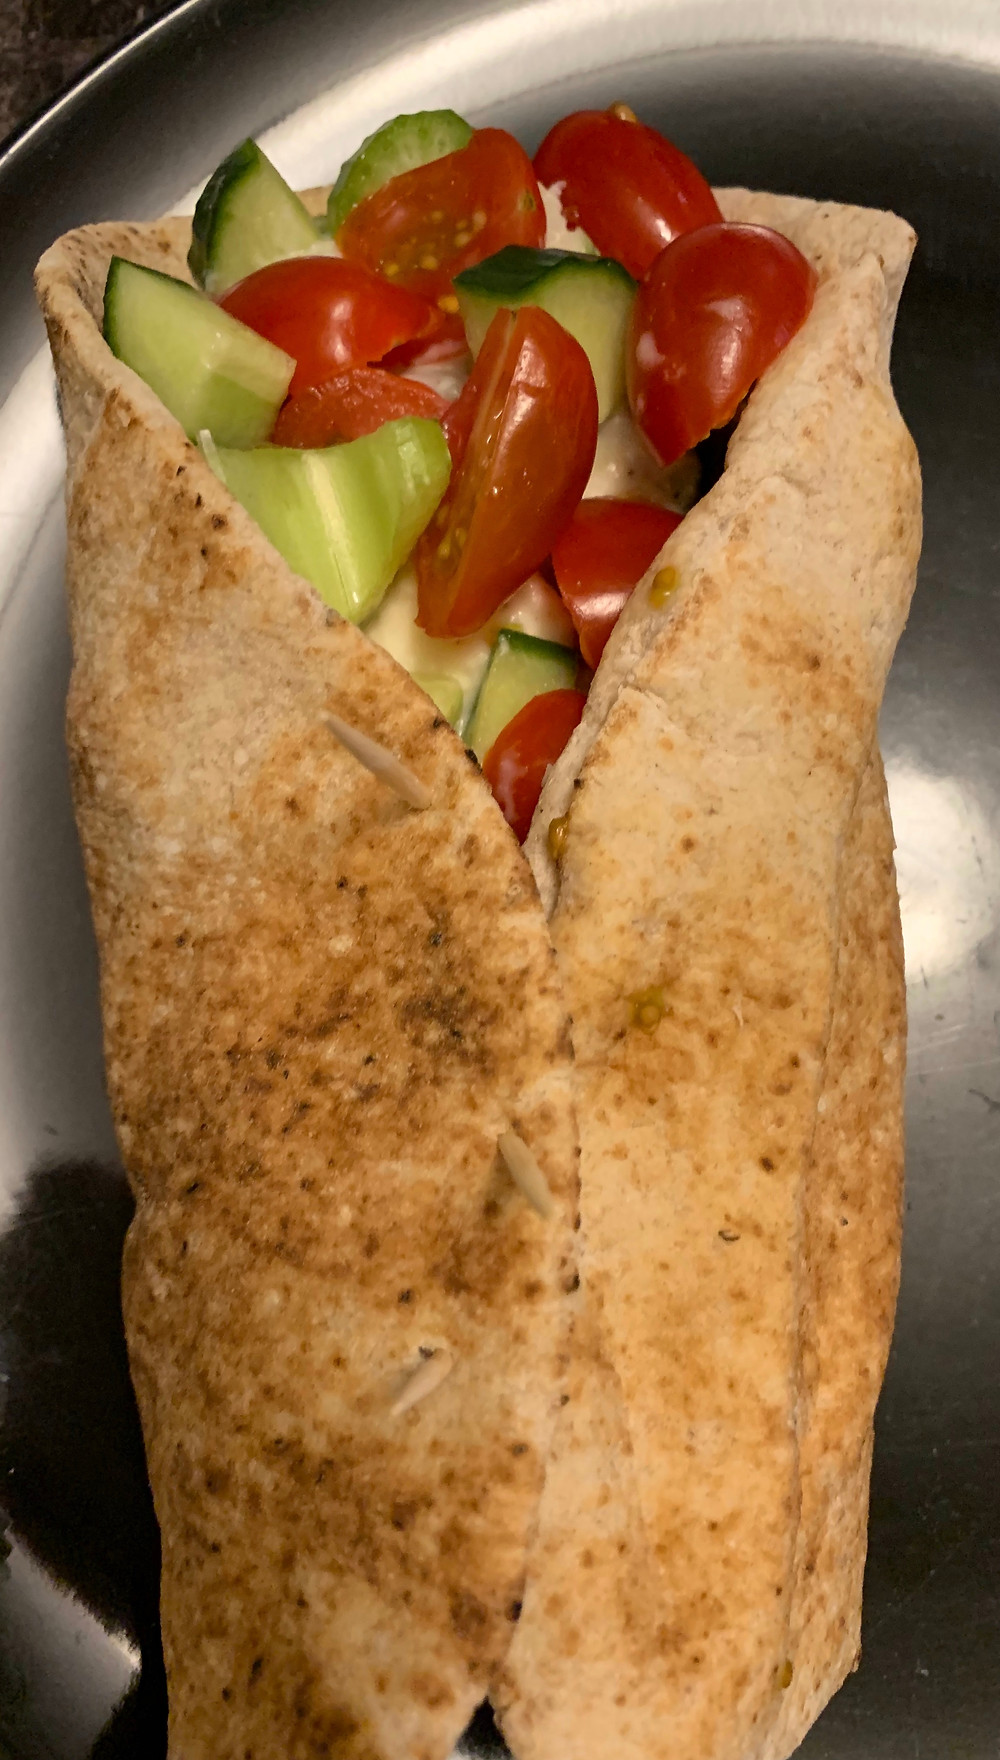 Costco Good Foods Tzatziki Style Chicken Salad Pita Wrap